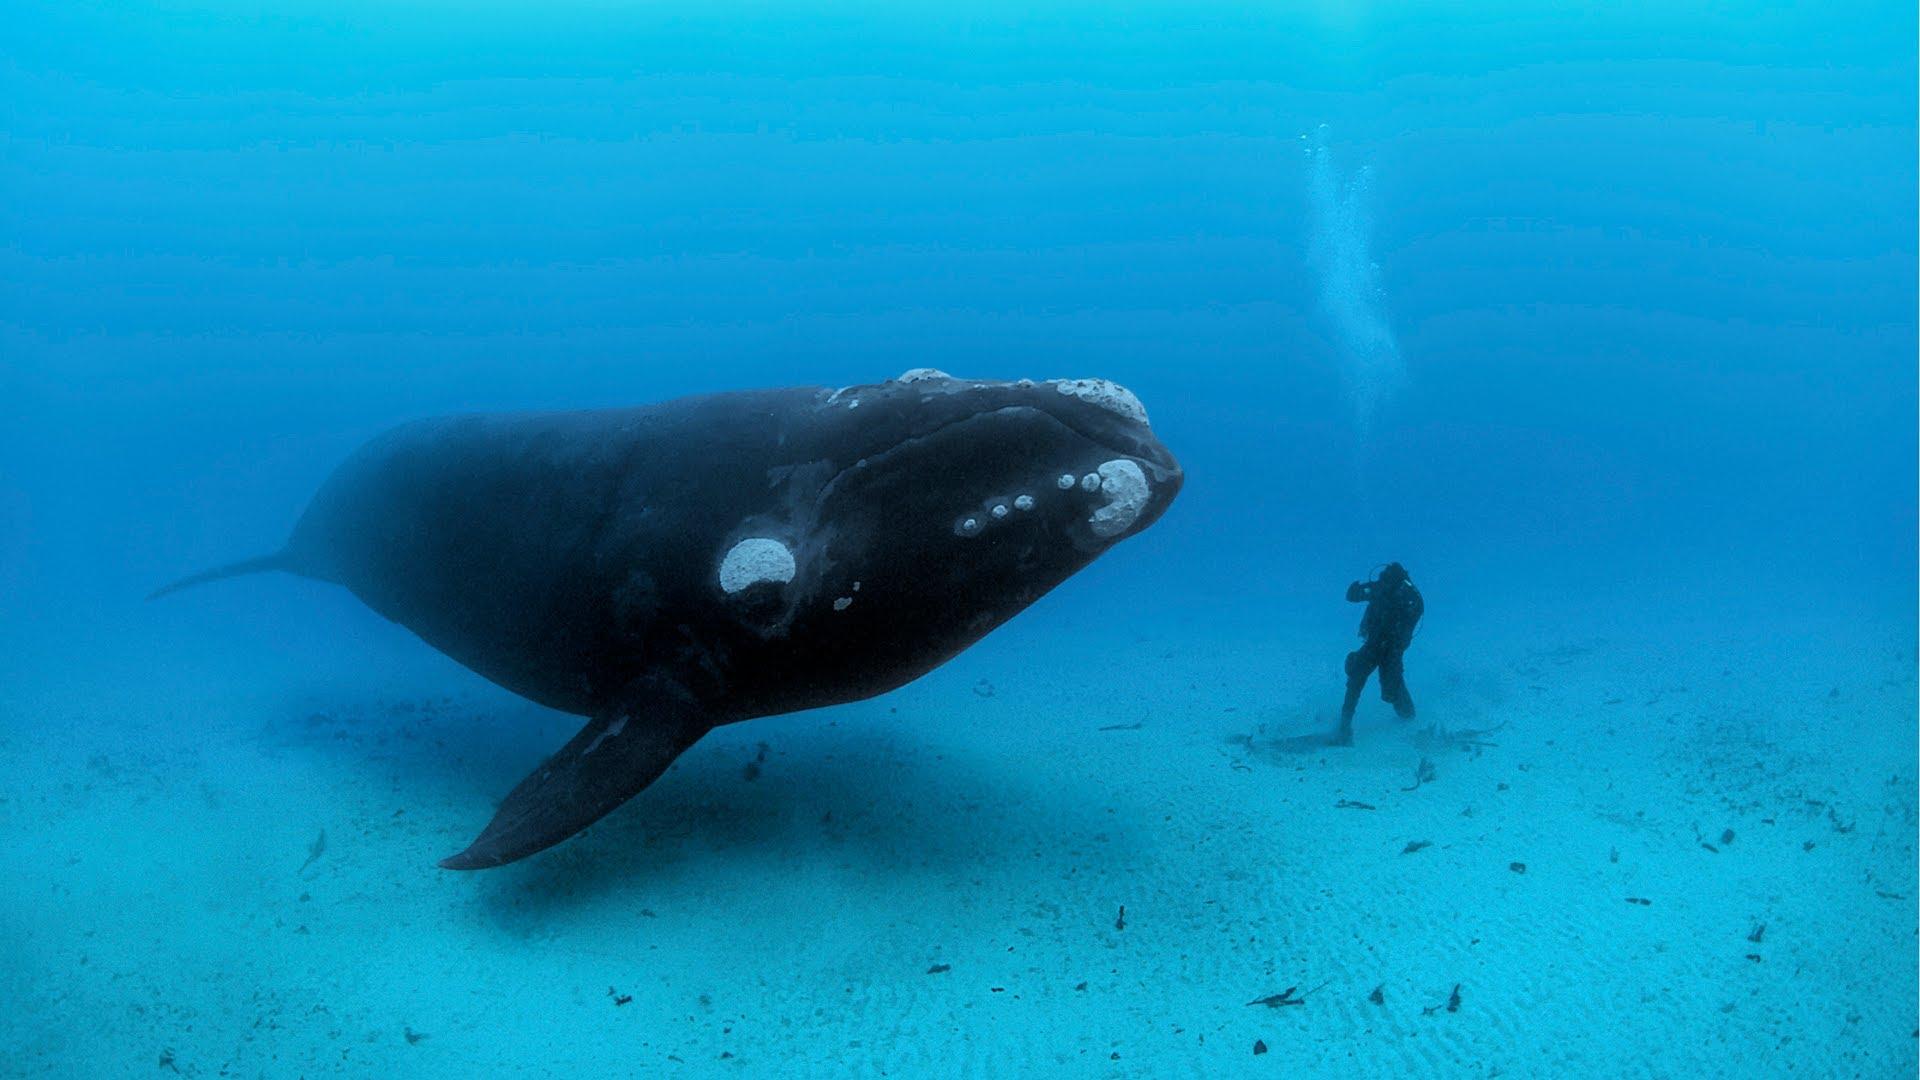 Whale diver underwater